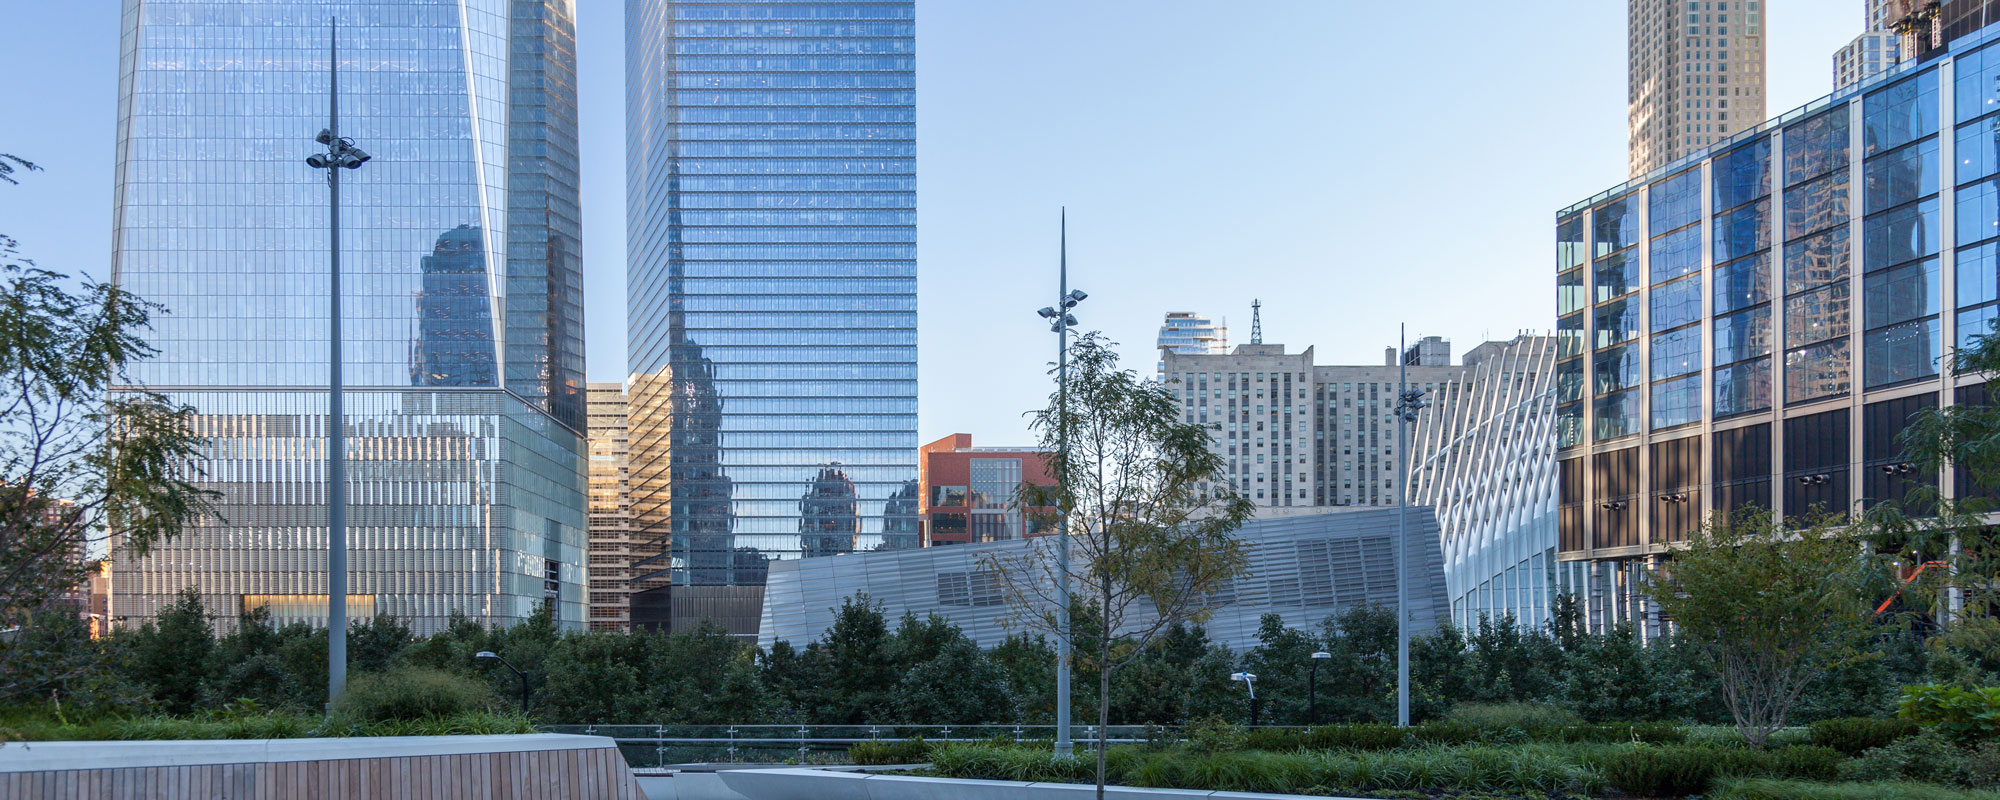 D_NYC_Liberty-park